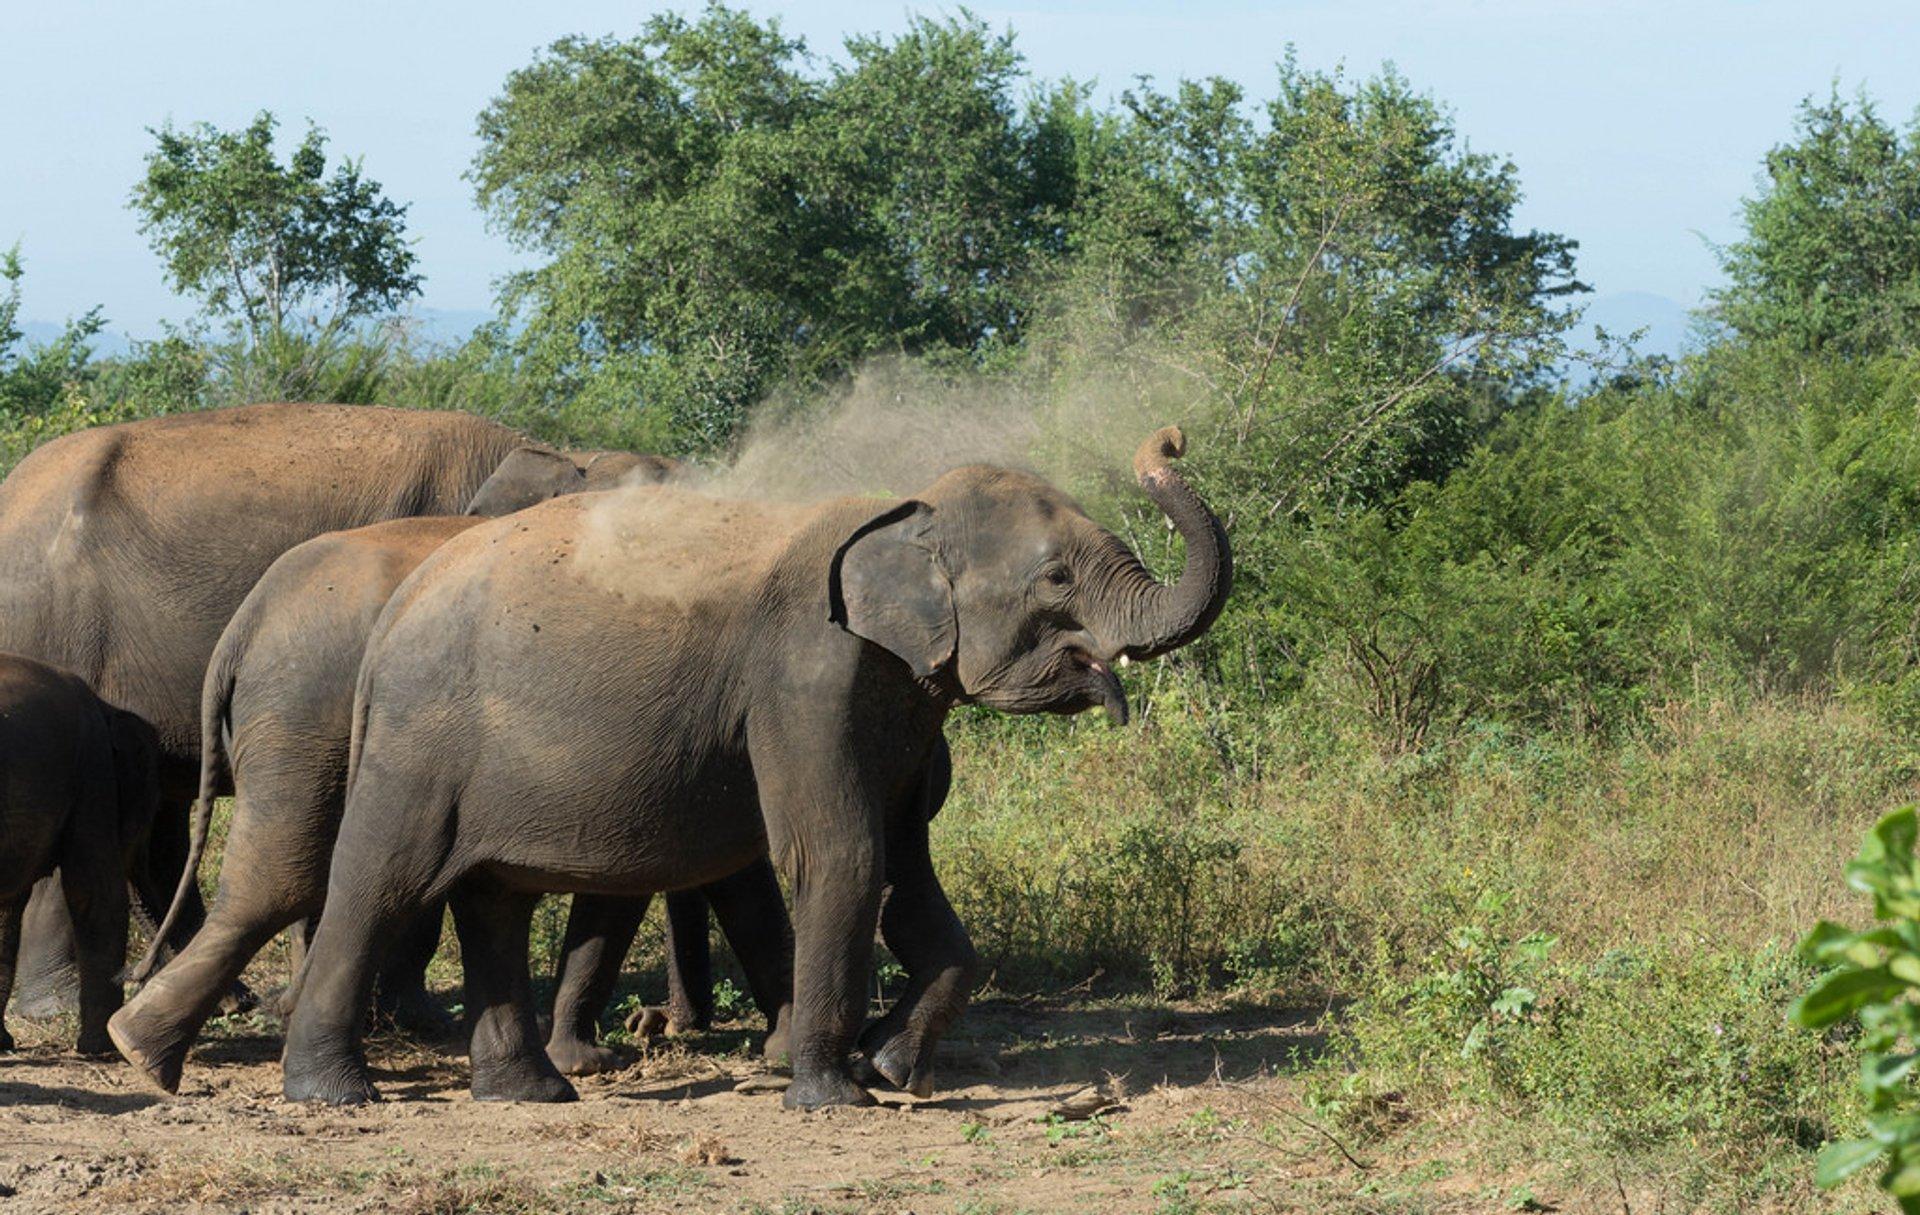 Elephant Safari in Udawalawe National Park in Sri Lanka 2020 - Best Time